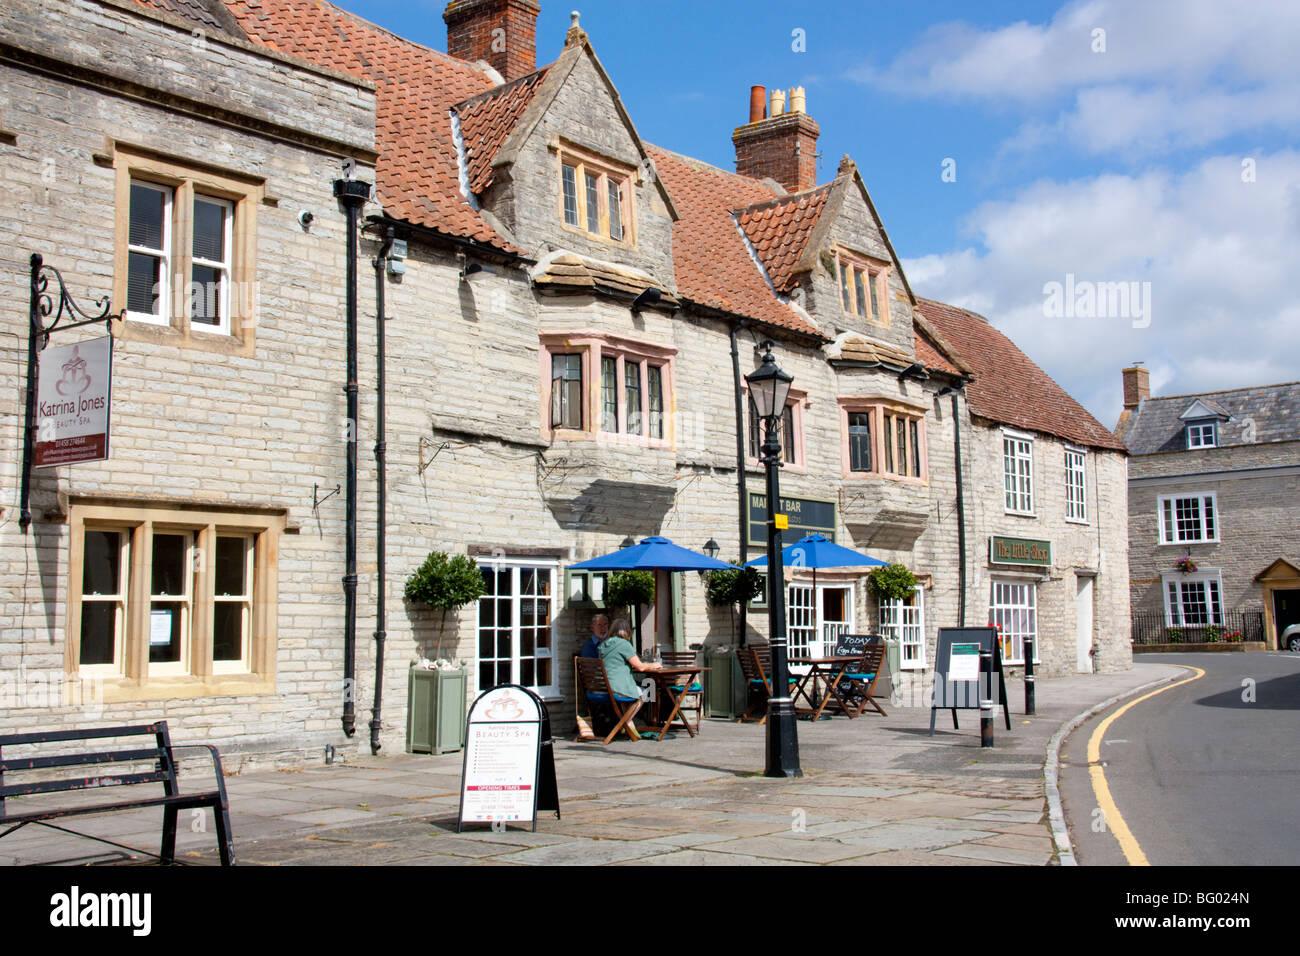 Street Scene, Somerton, Somerset England - Stock Image